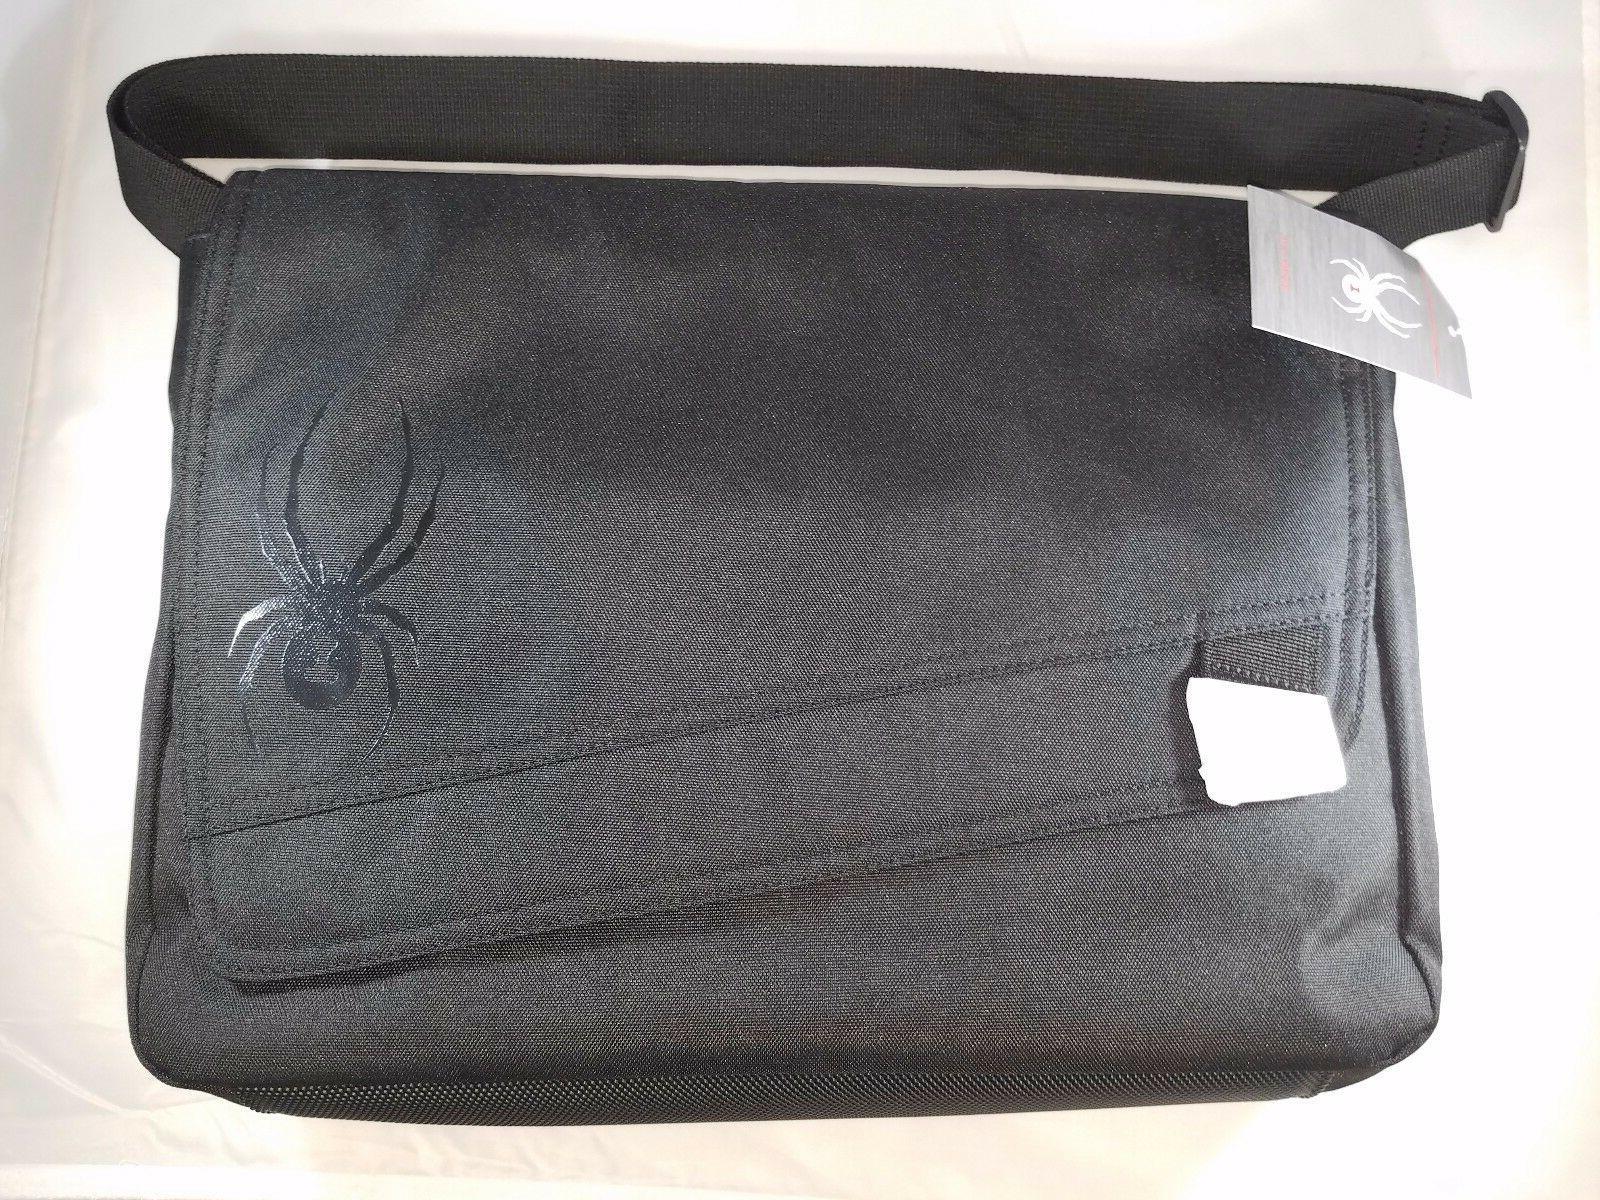 Spyder Messenger Bag Blackout Case Street Wear Accessories T